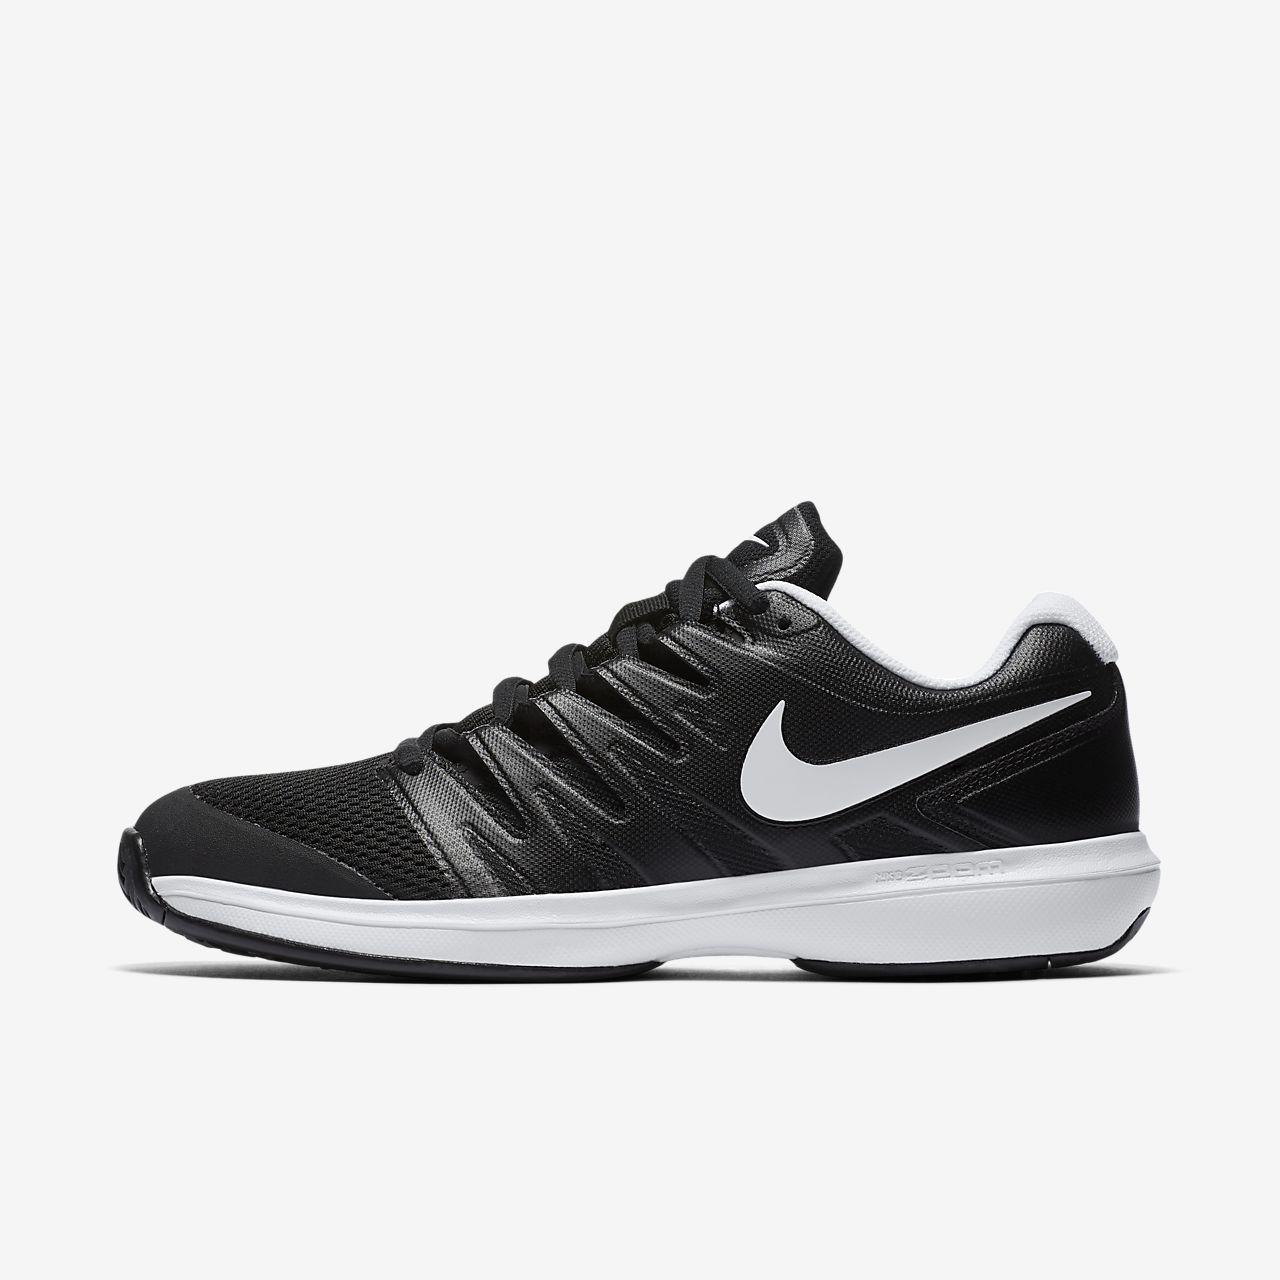 quality design 2b845 5d162 ... NikeCourt Air Zoom Prestige tennissko til hard court til herre